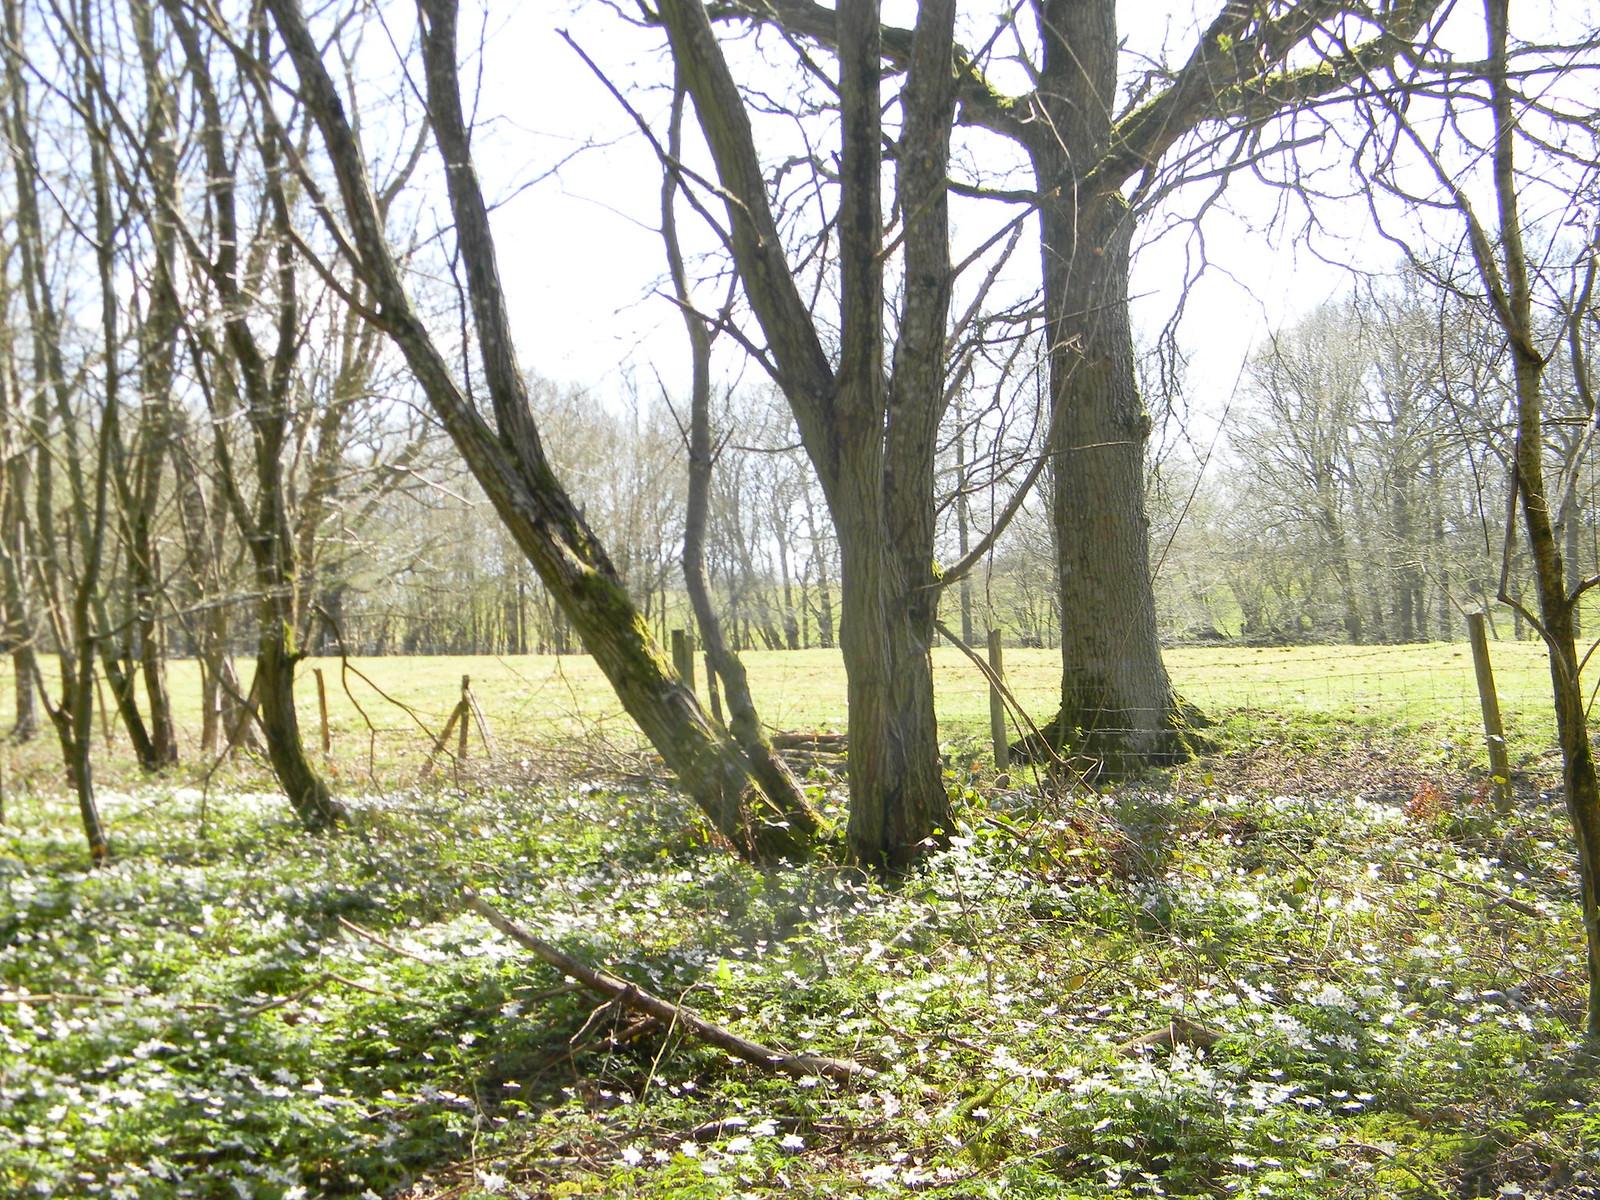 Wood,,with wood anenomes Robertsbridge to Battle